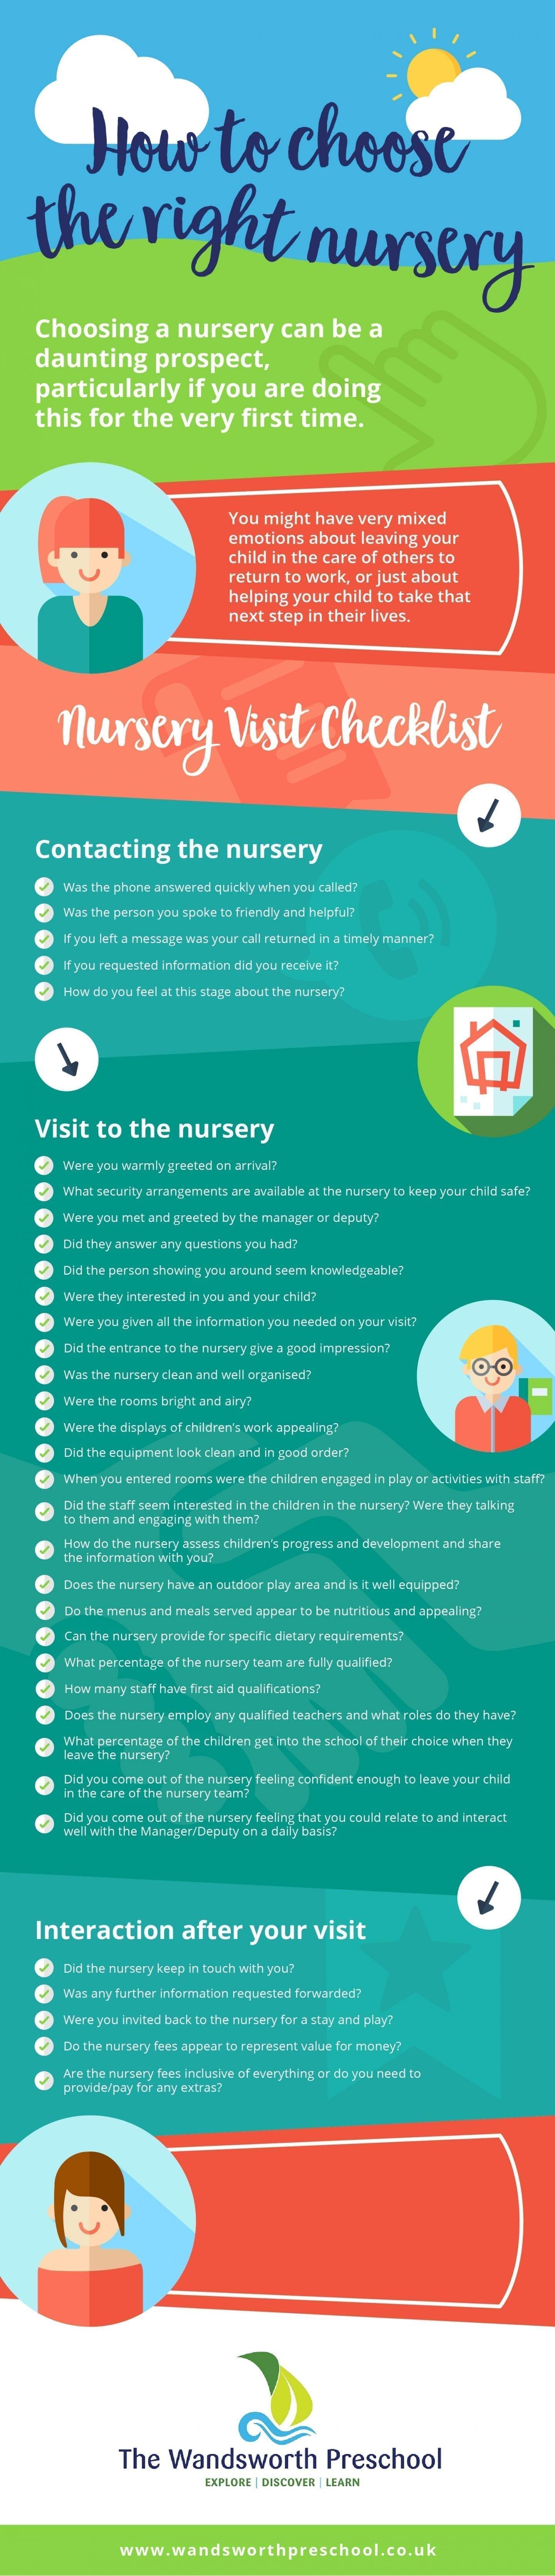 nursery visit checklist Wandsworth Preshcool